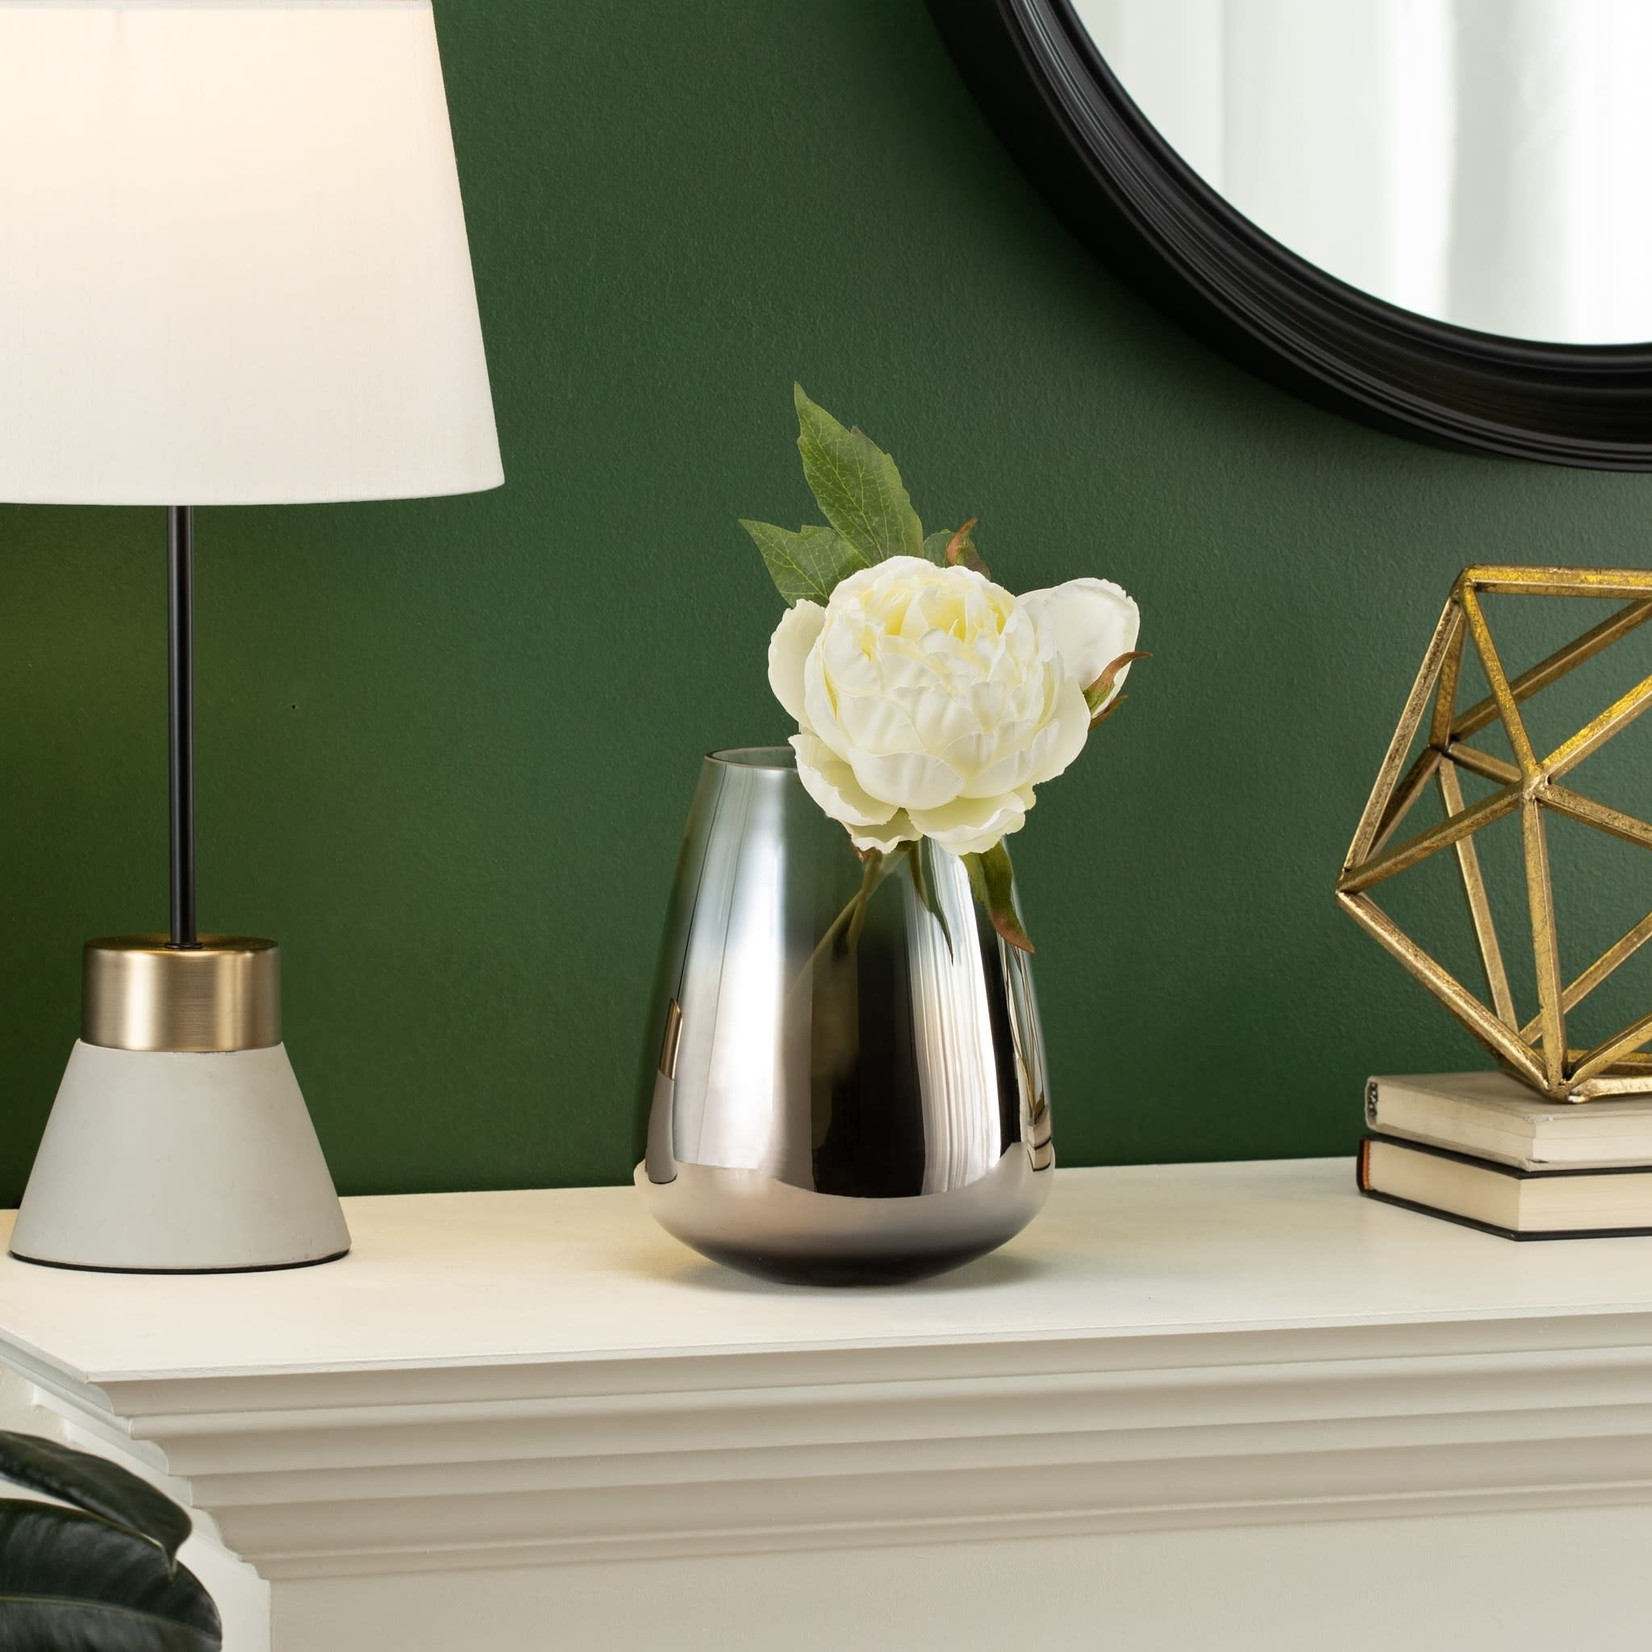 Torre & Tagus Smoke Mirror Vase